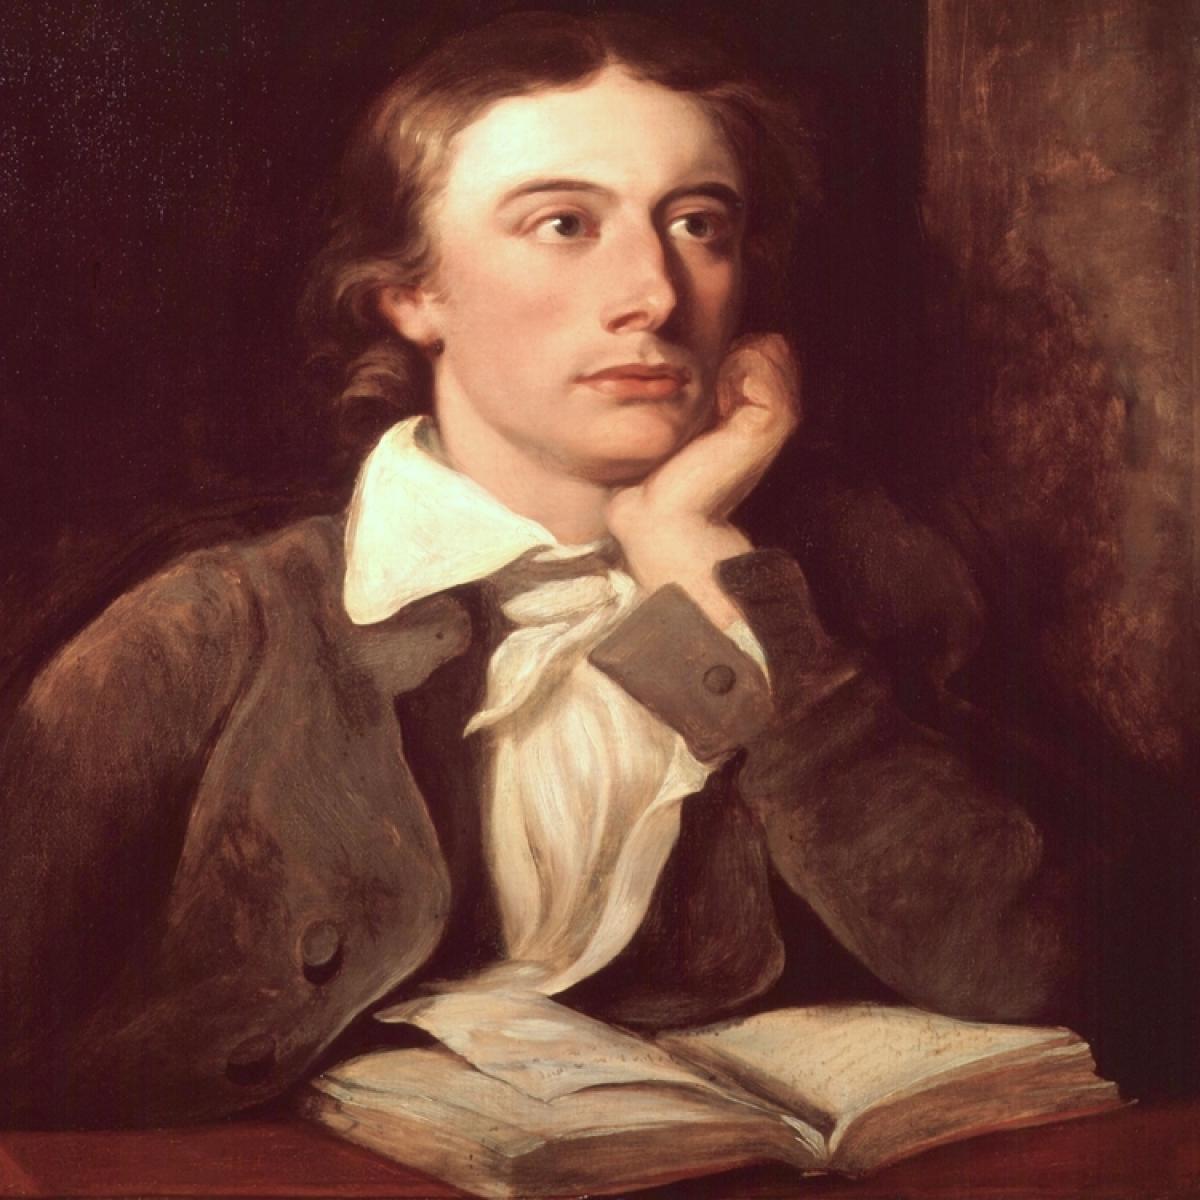 Poet of Pain: Reliving John Keats' saga of pain and pathos